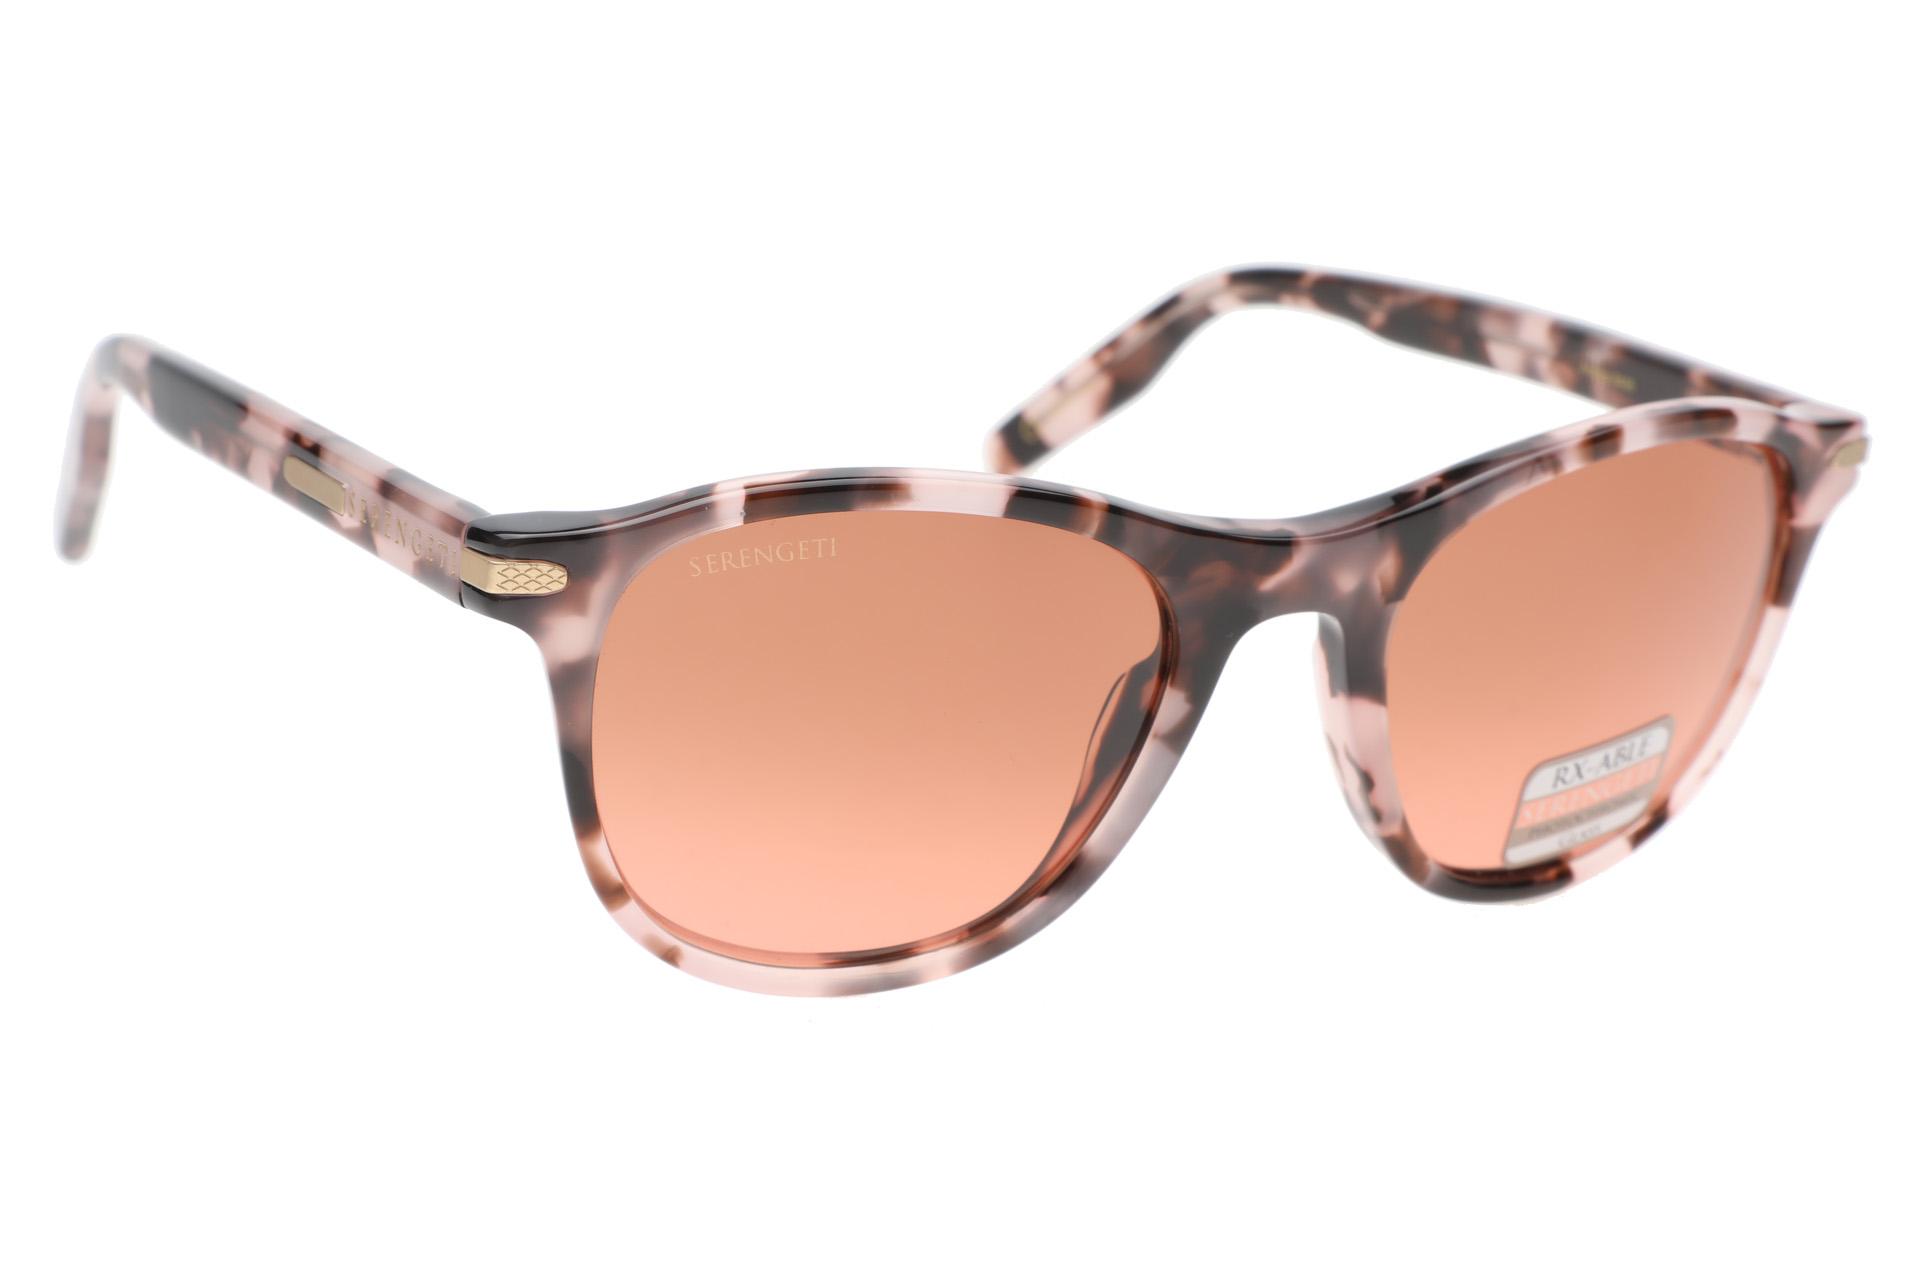 8a38307f197 Serengeti Andrea 8466 (Pink Tortoise) Gradient